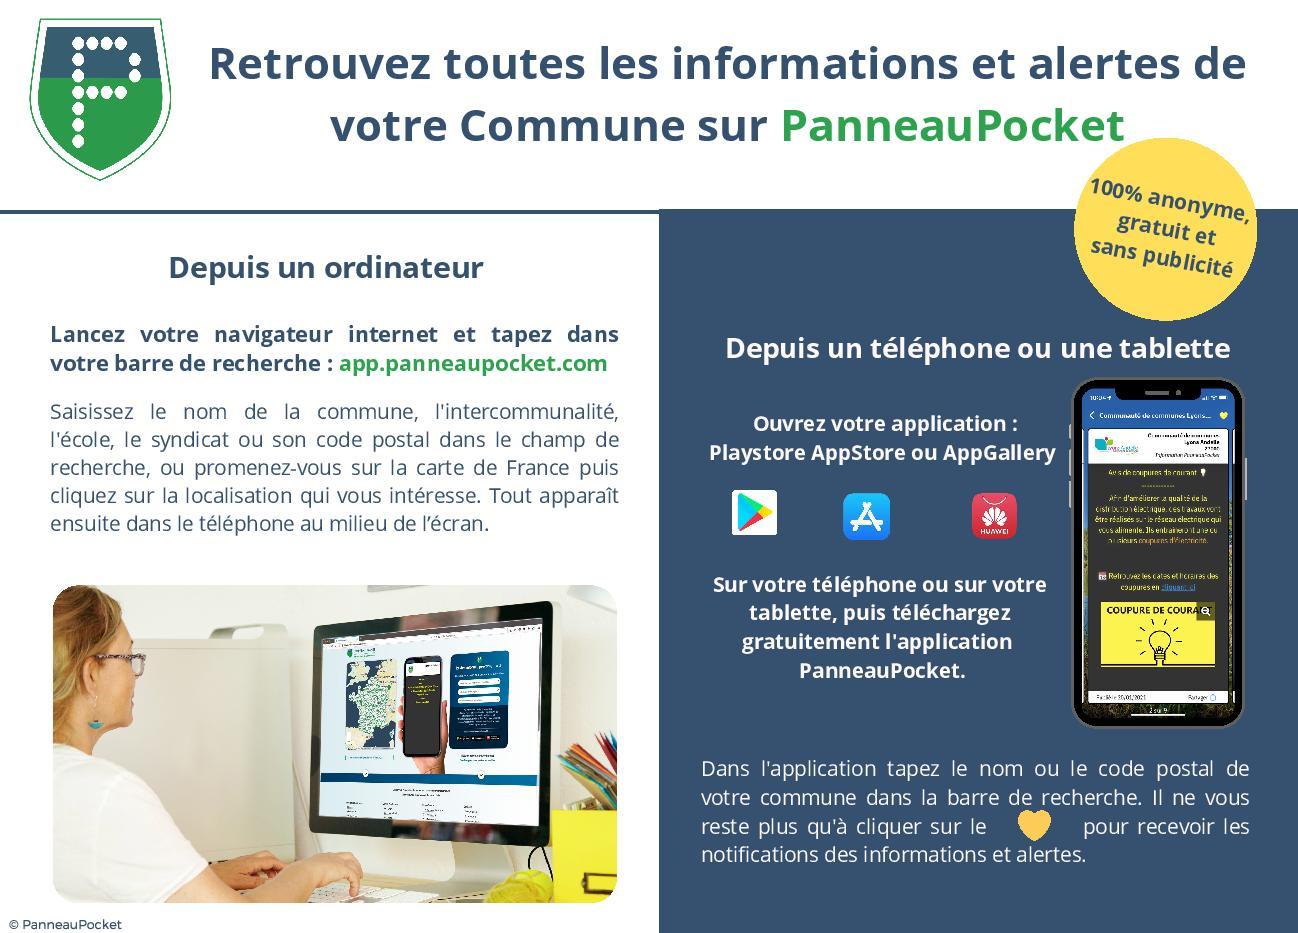 https://www.villers-les-luxeuil.com/projets/villers/files/images/2021_Mairie/PanneauPocket/Visuel_mairie.jpg